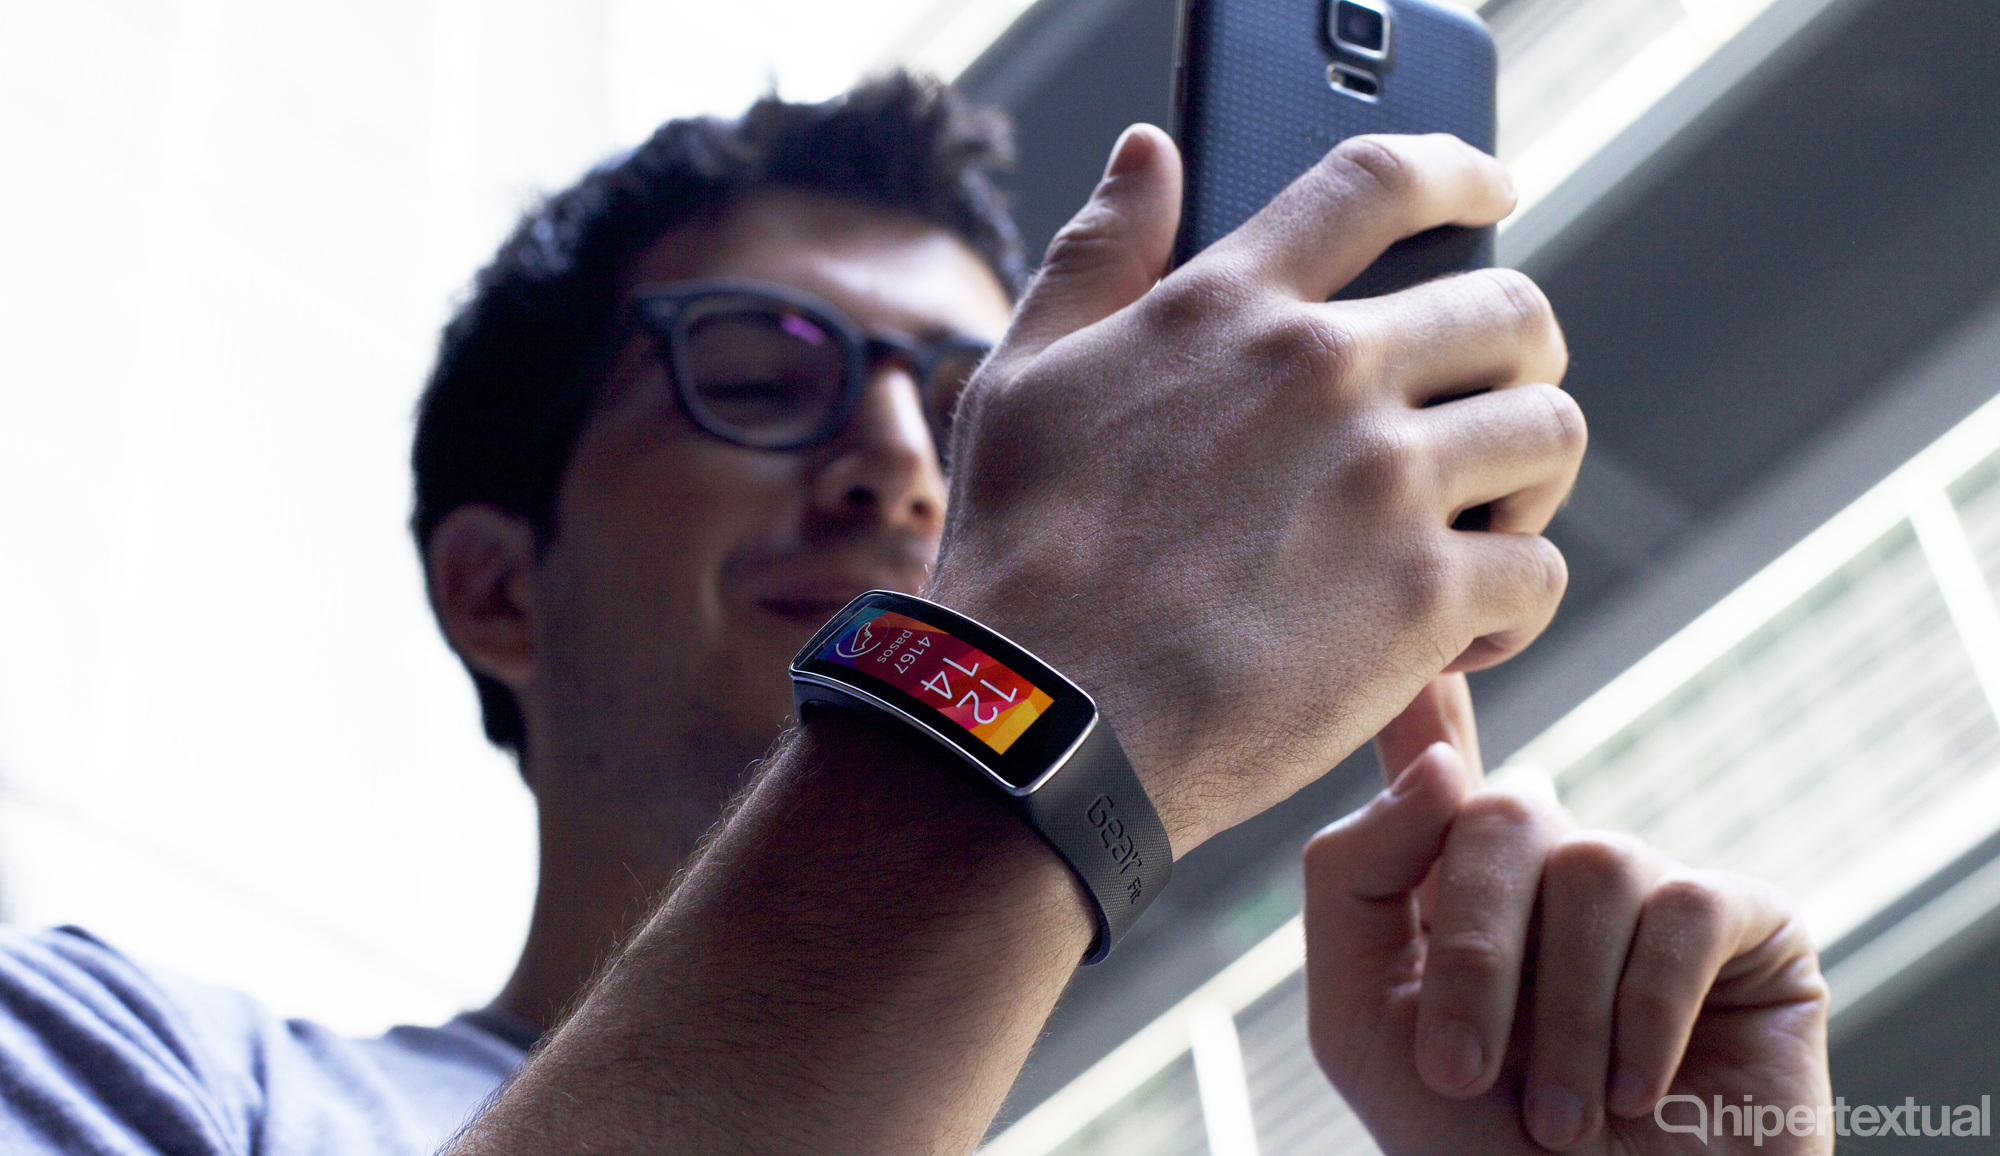 Samsung Gear Fit Jose